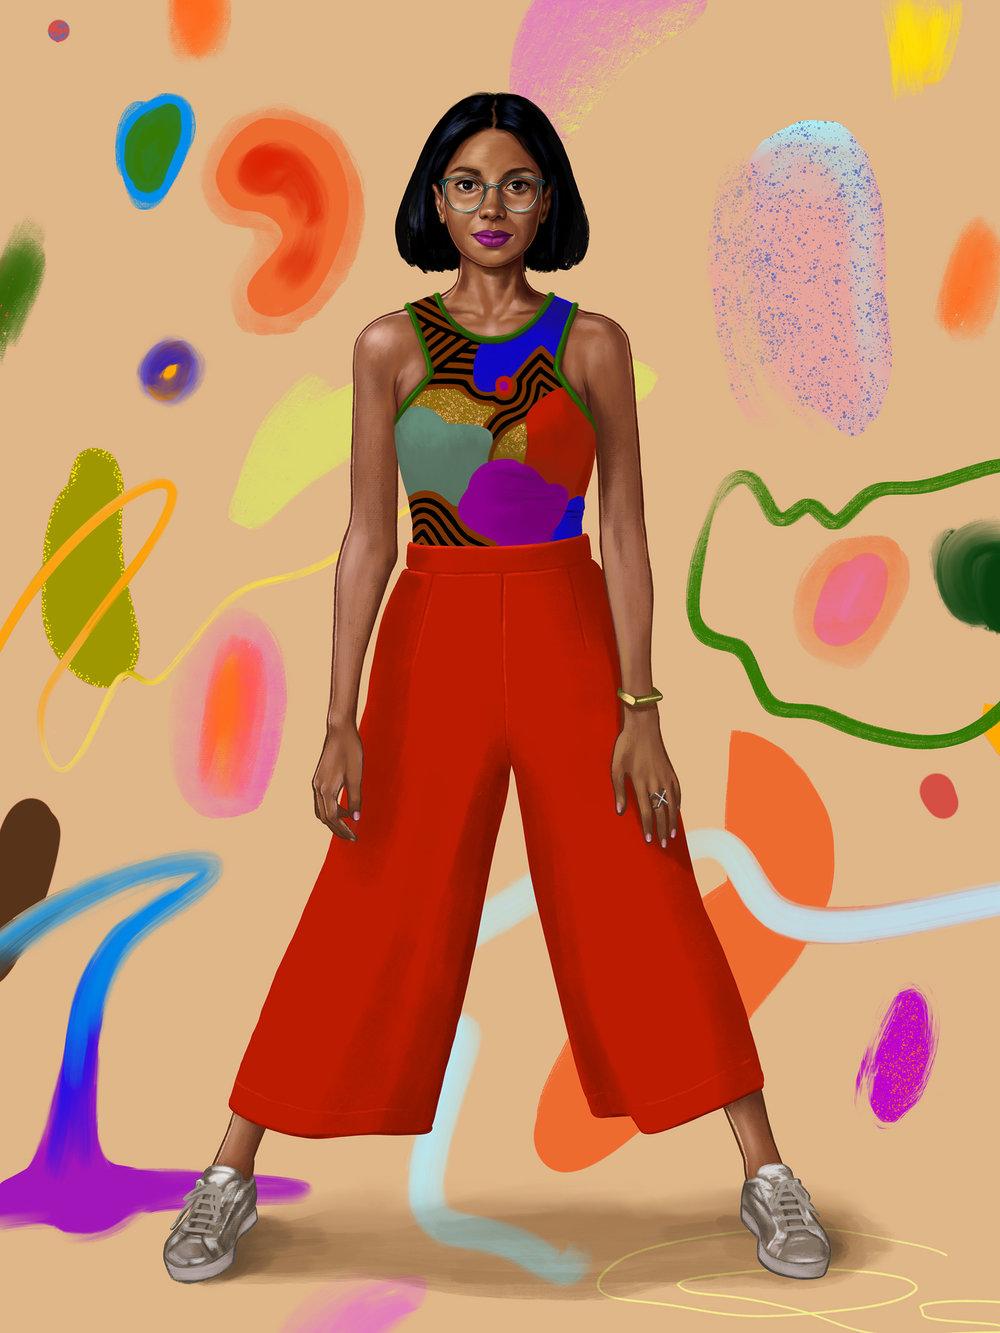 Self Portrait,  Digital Painting done on Procreate App for iPad Pro, Image Via Shyama Golden